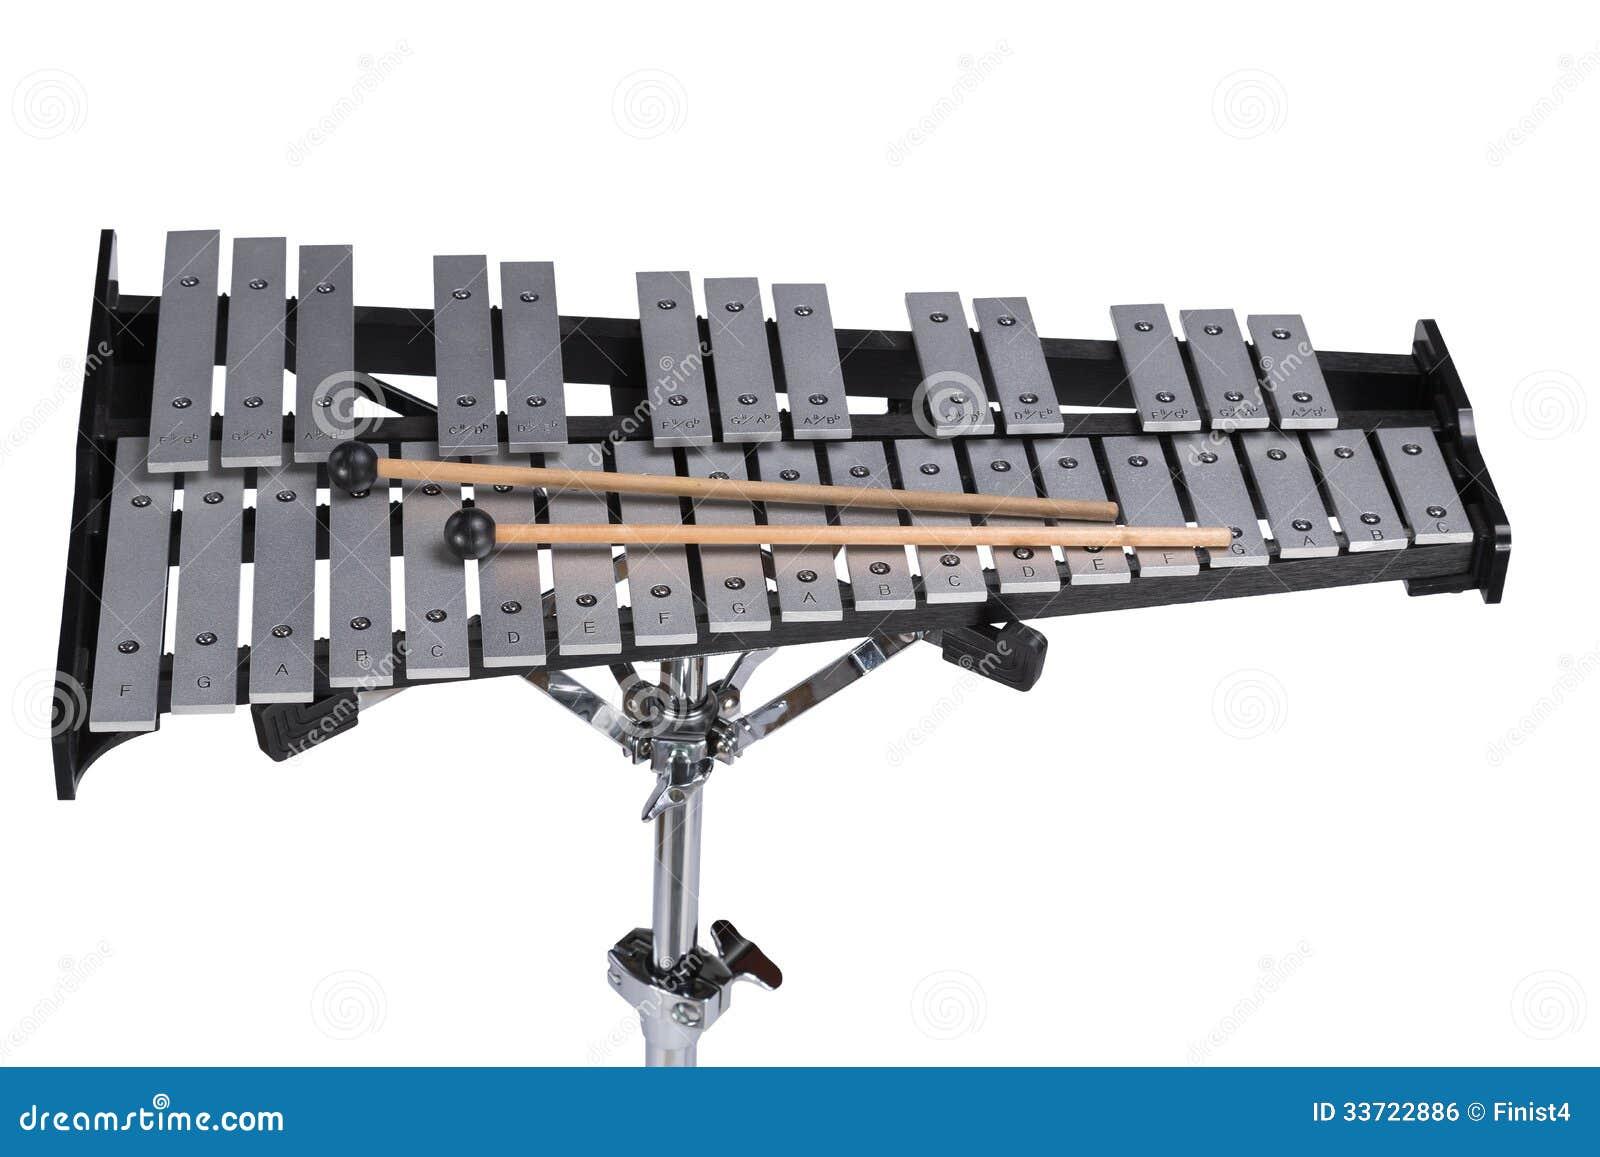 Glockenspiel Royalty Free Stock Image - Image: 33722886